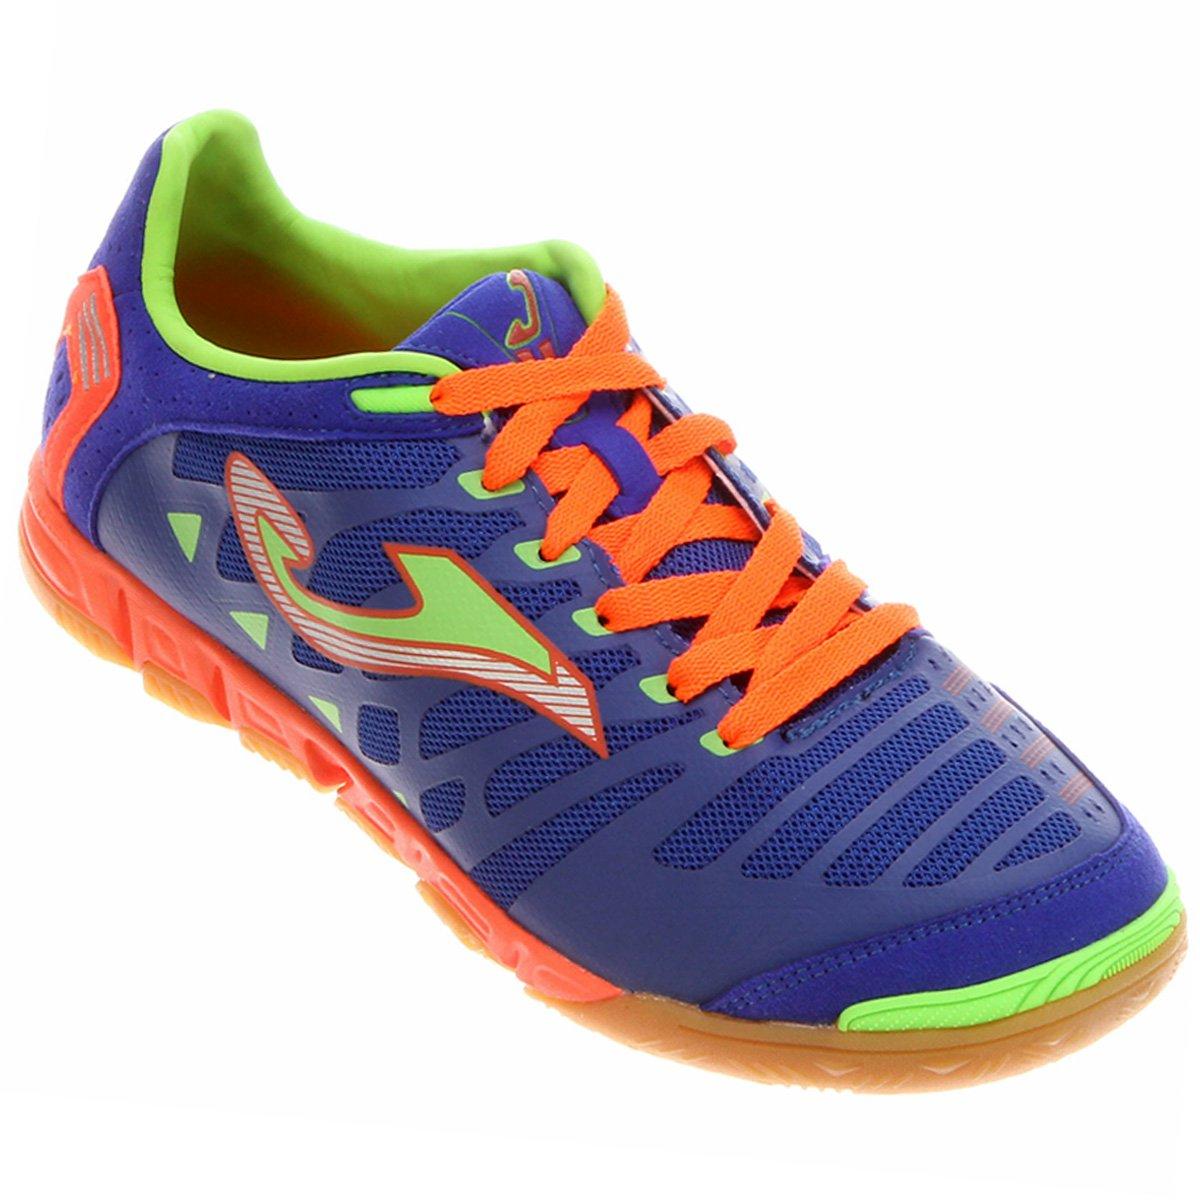 Chuteira Joma Super Regate Futsal - Compre Agora  314ac5151b9f0